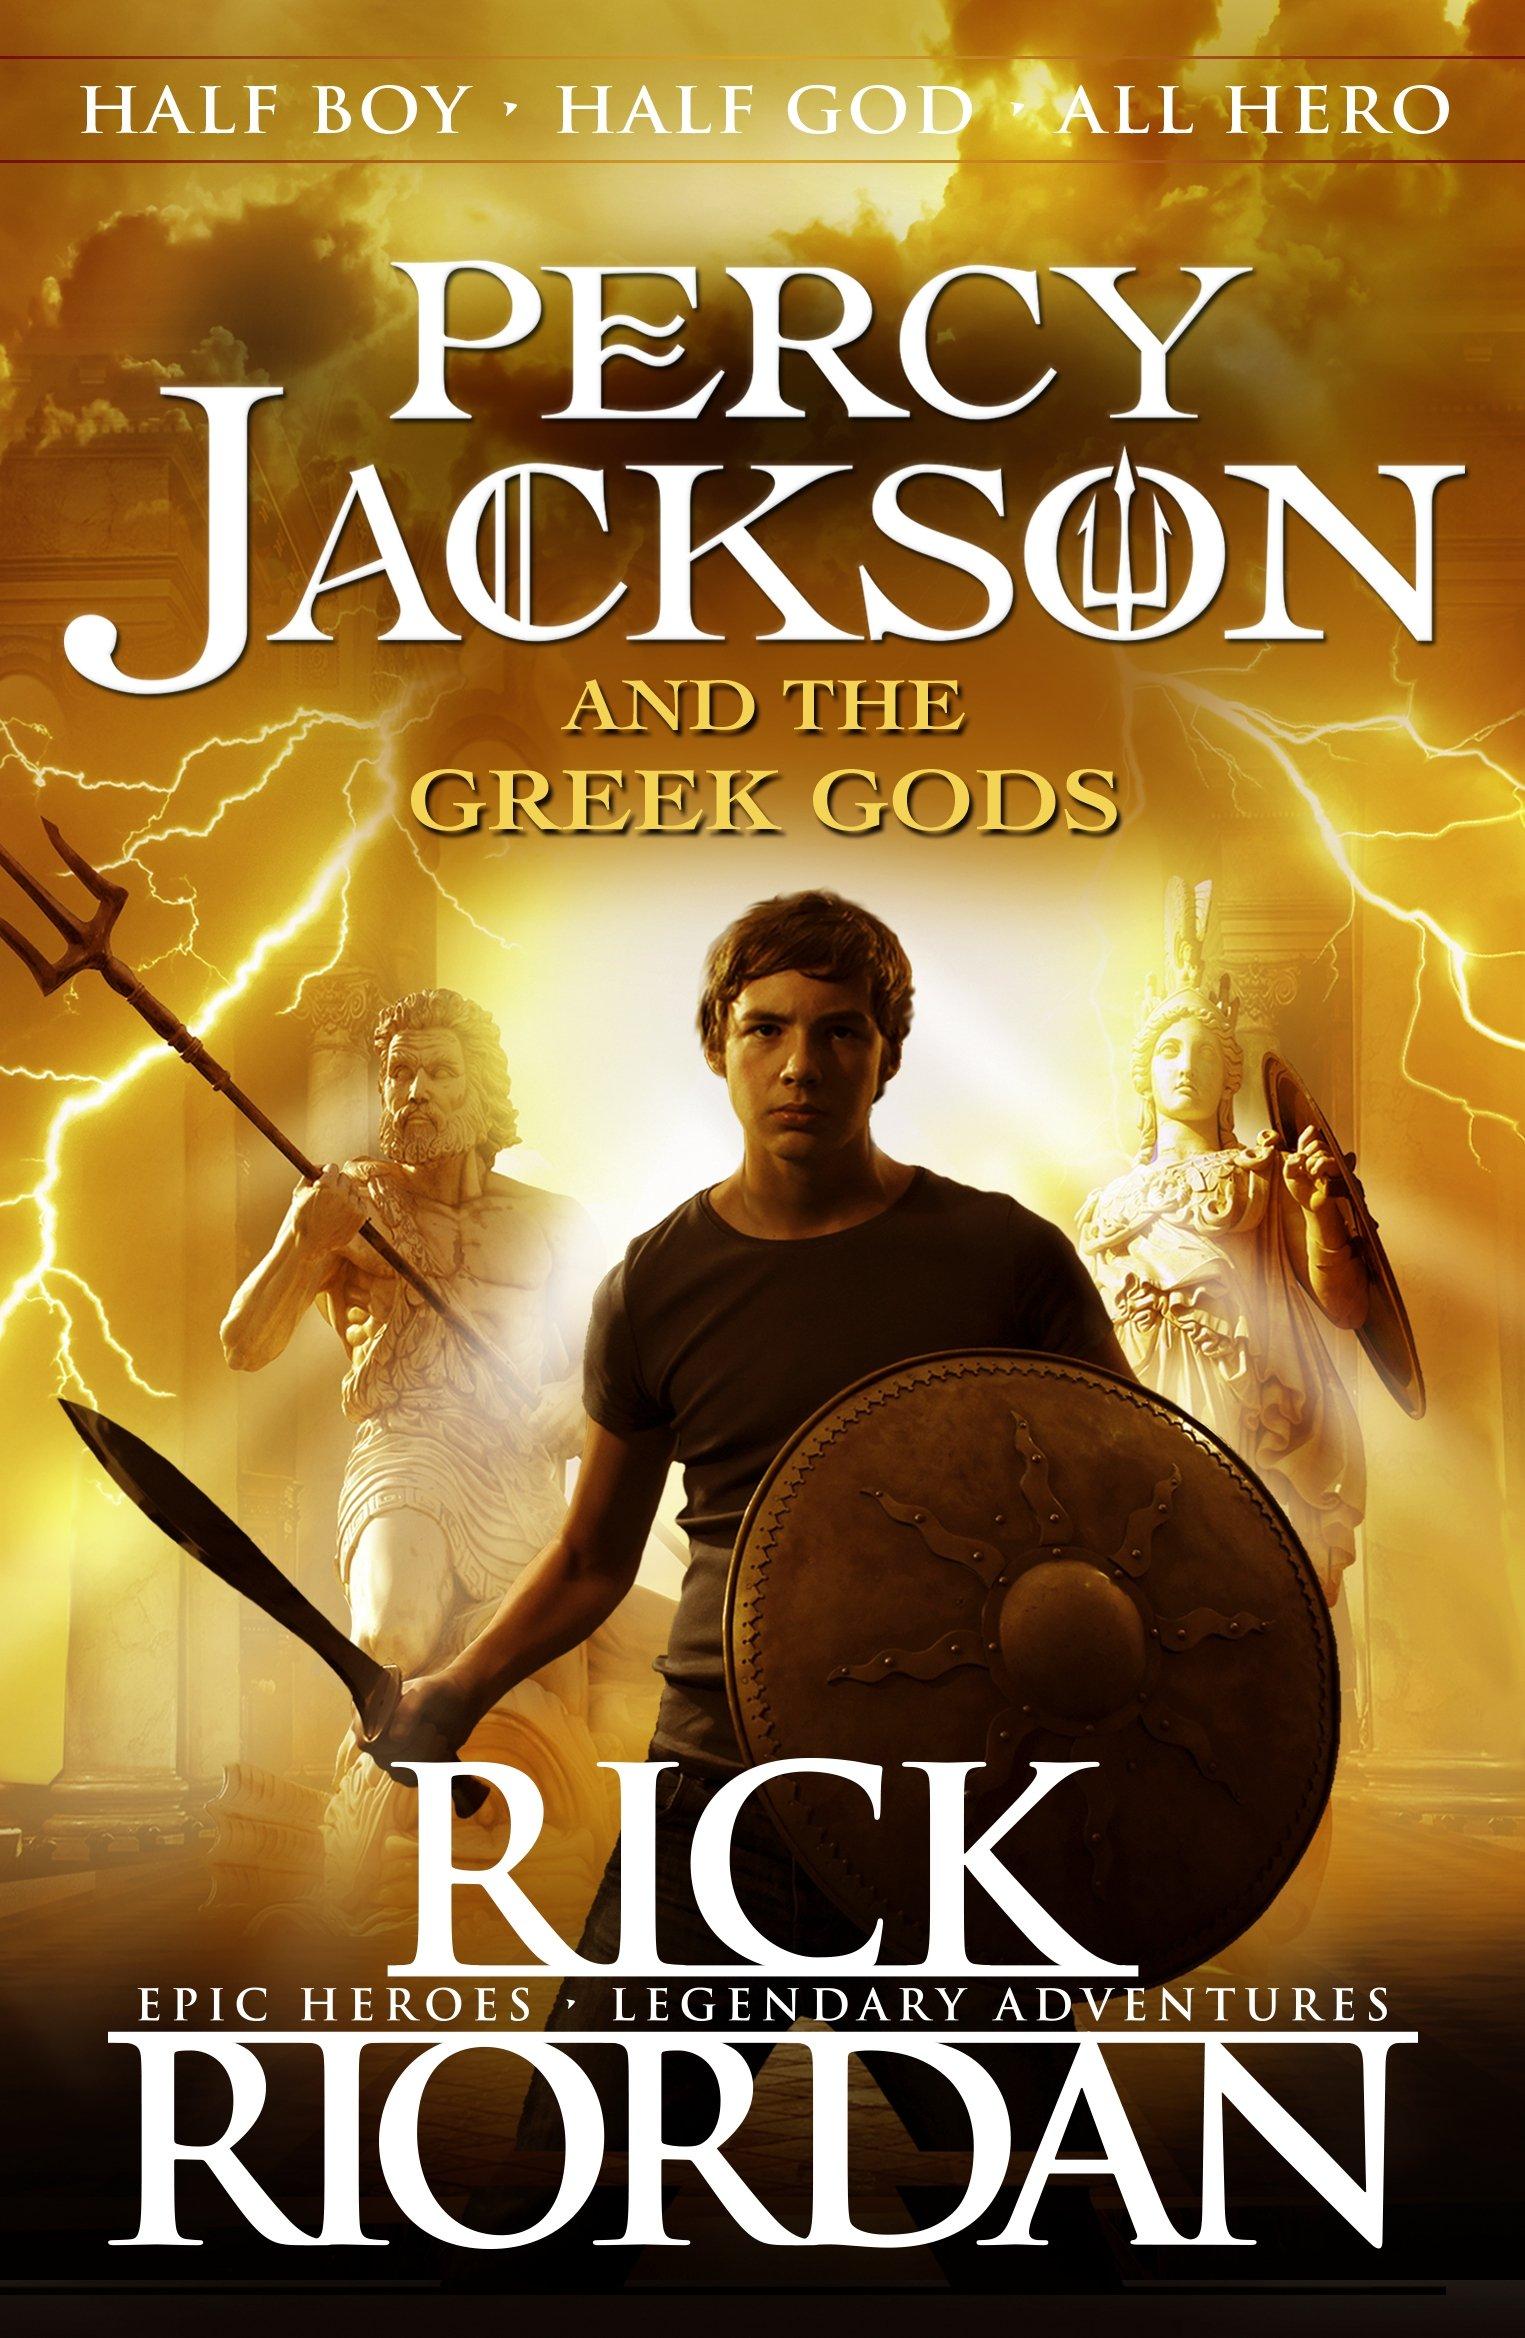 Percy Jackson and the Greek Gods Percy Jackson s Greek Myths  Amazon ... e898c8299b30e